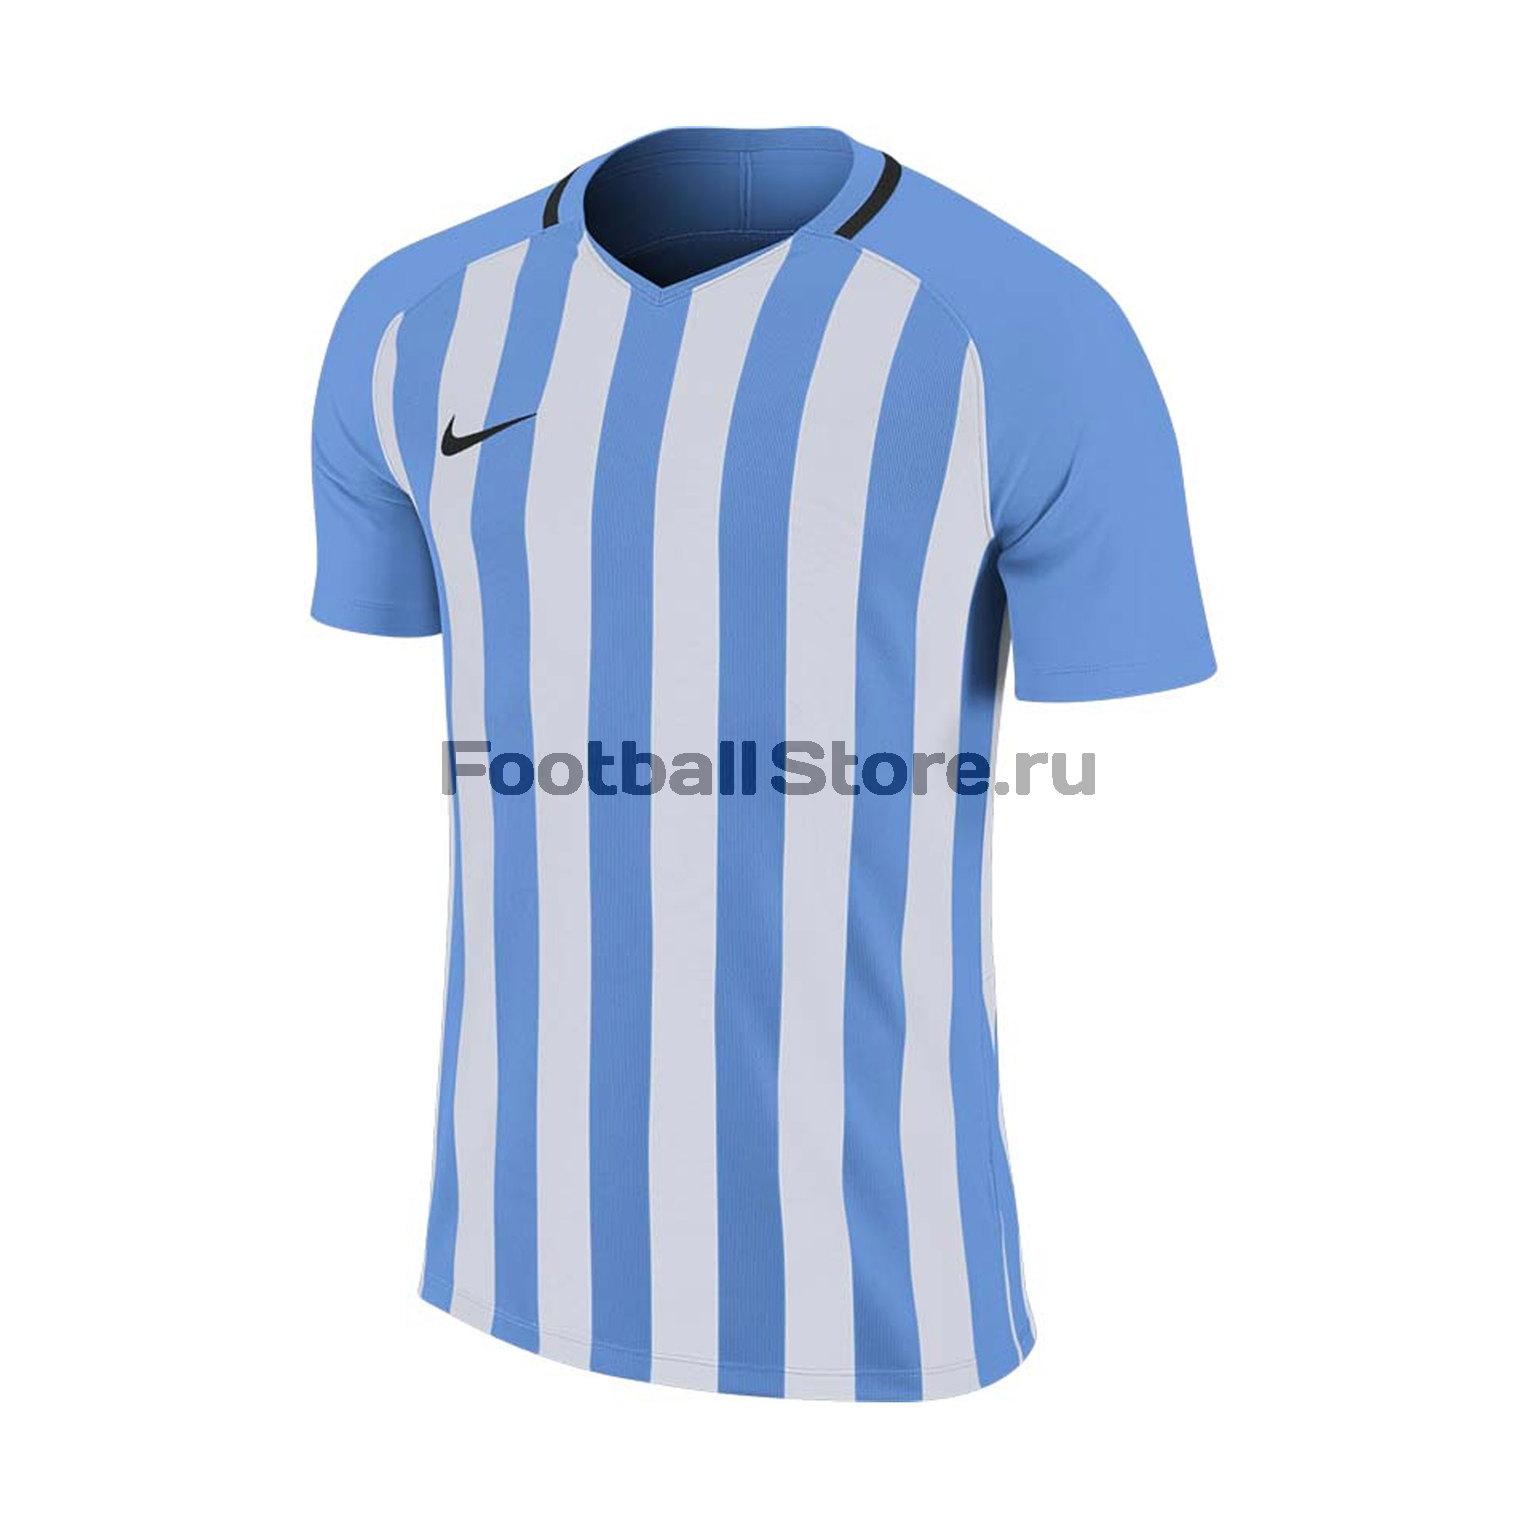 Футболка игровая Nike Striped Division III SS 894081-412 футболка nike ss boys victory ii jersey 588430 412